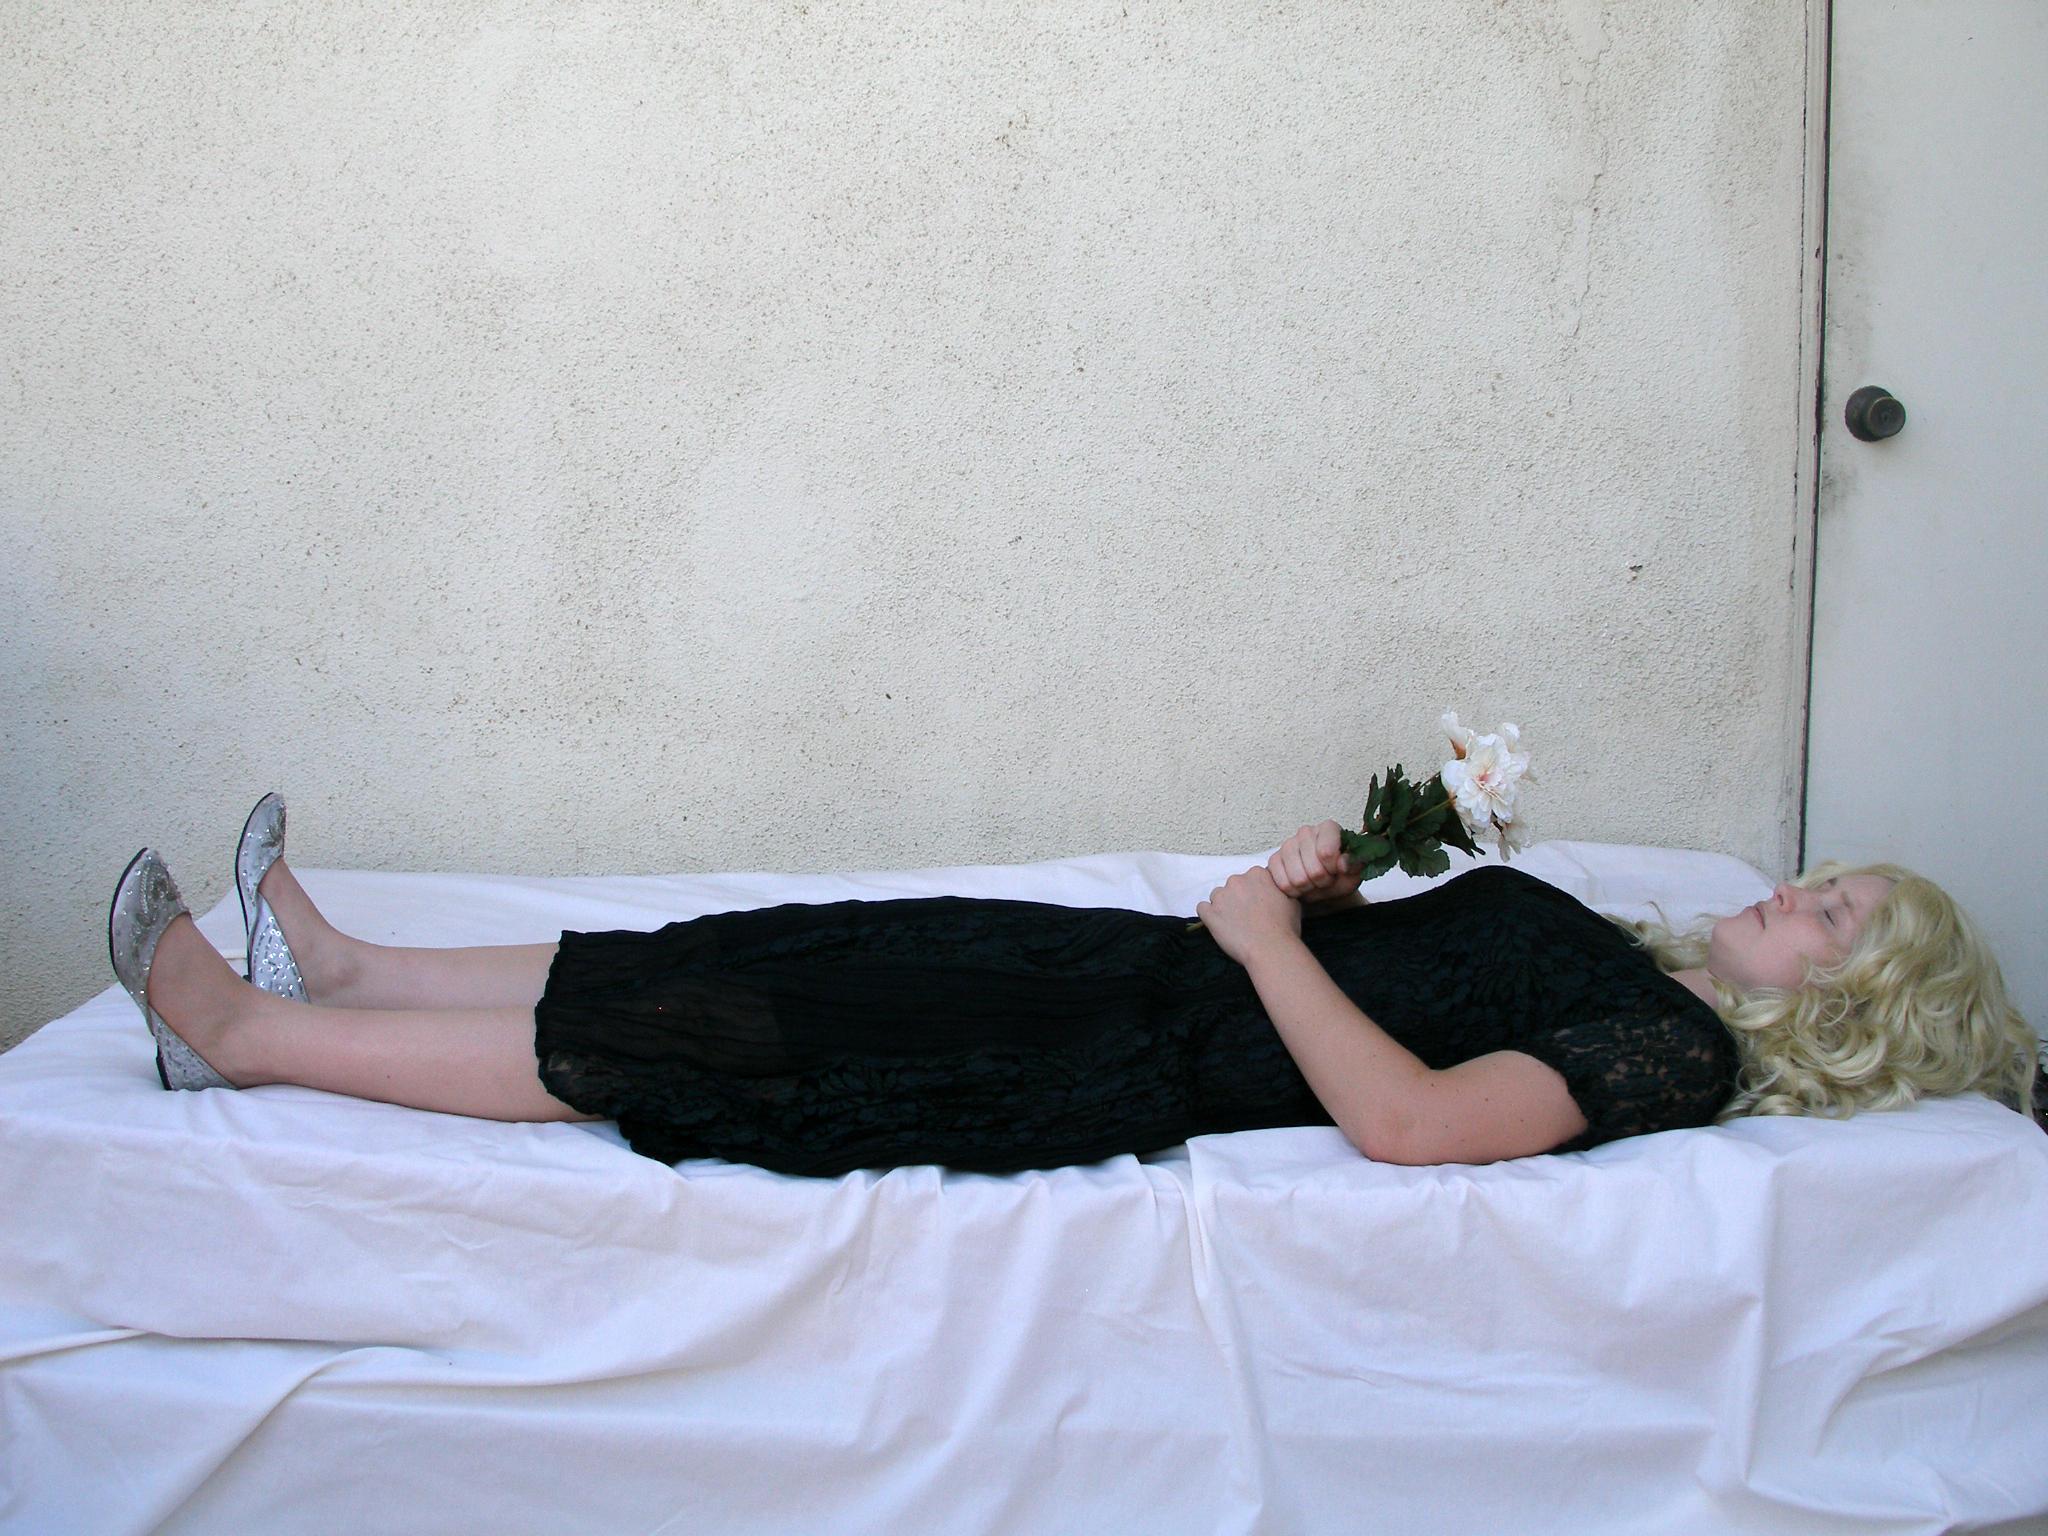 sleeping beauty2 by PhoeebStock